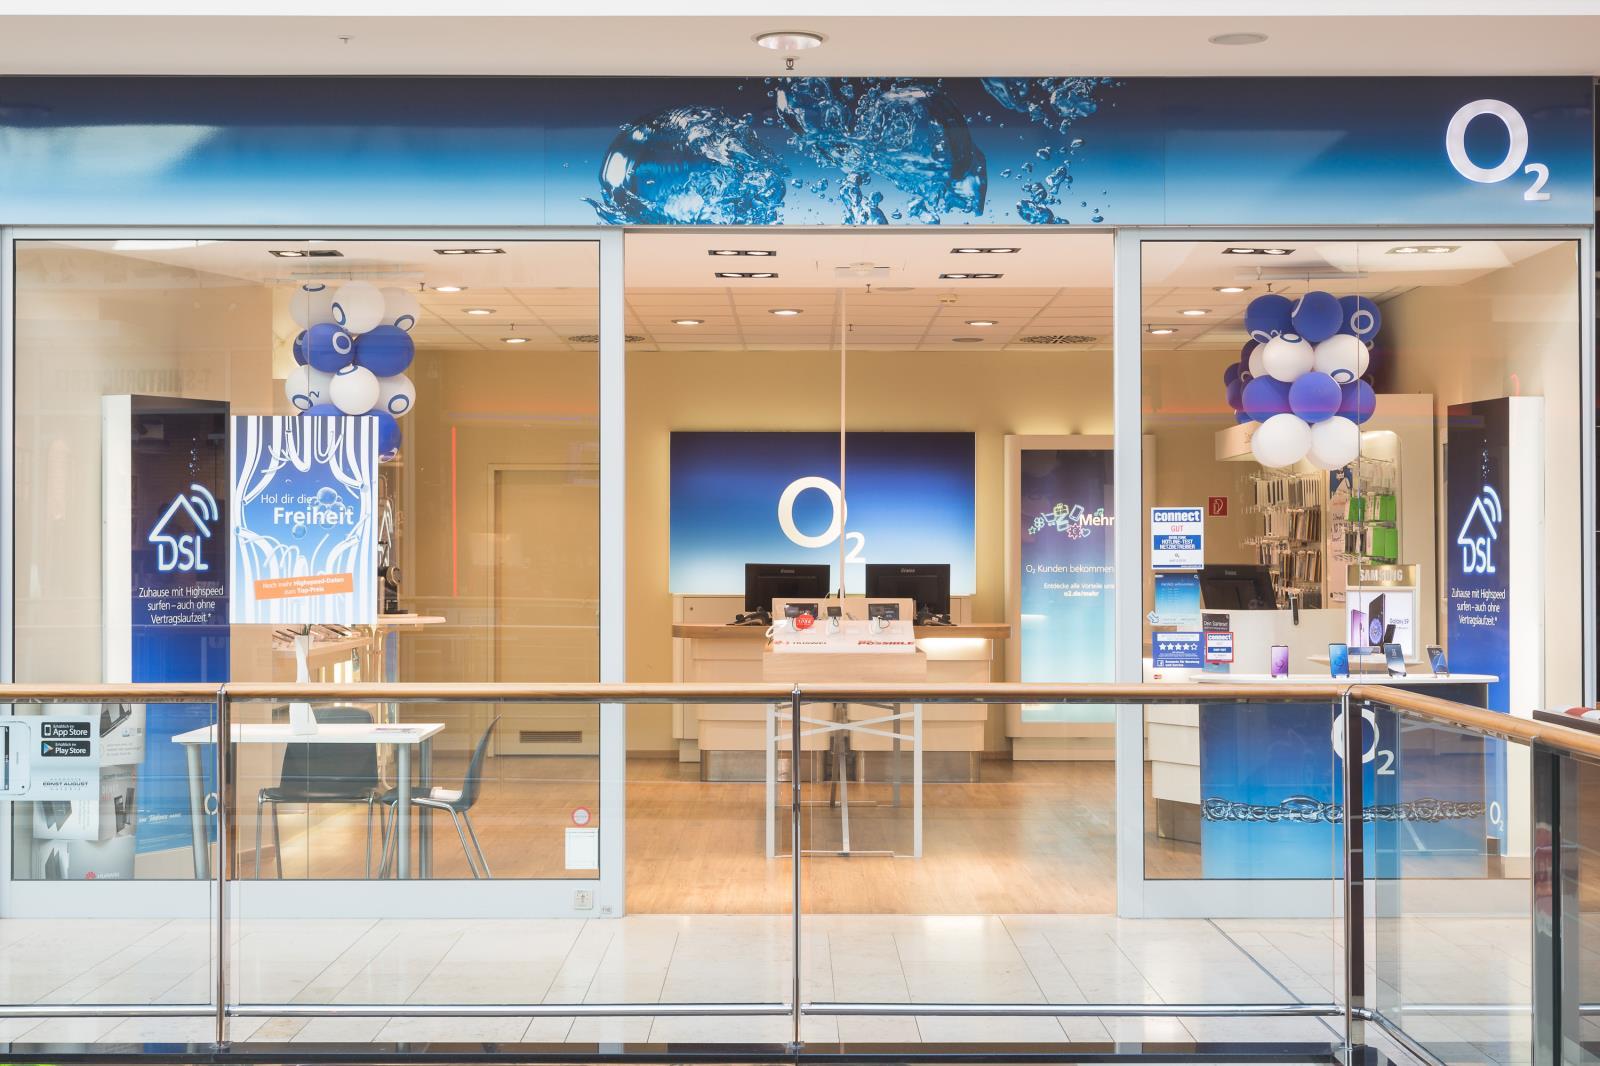 o2 Shop, Ernst-August-Platz 2 in Hannover